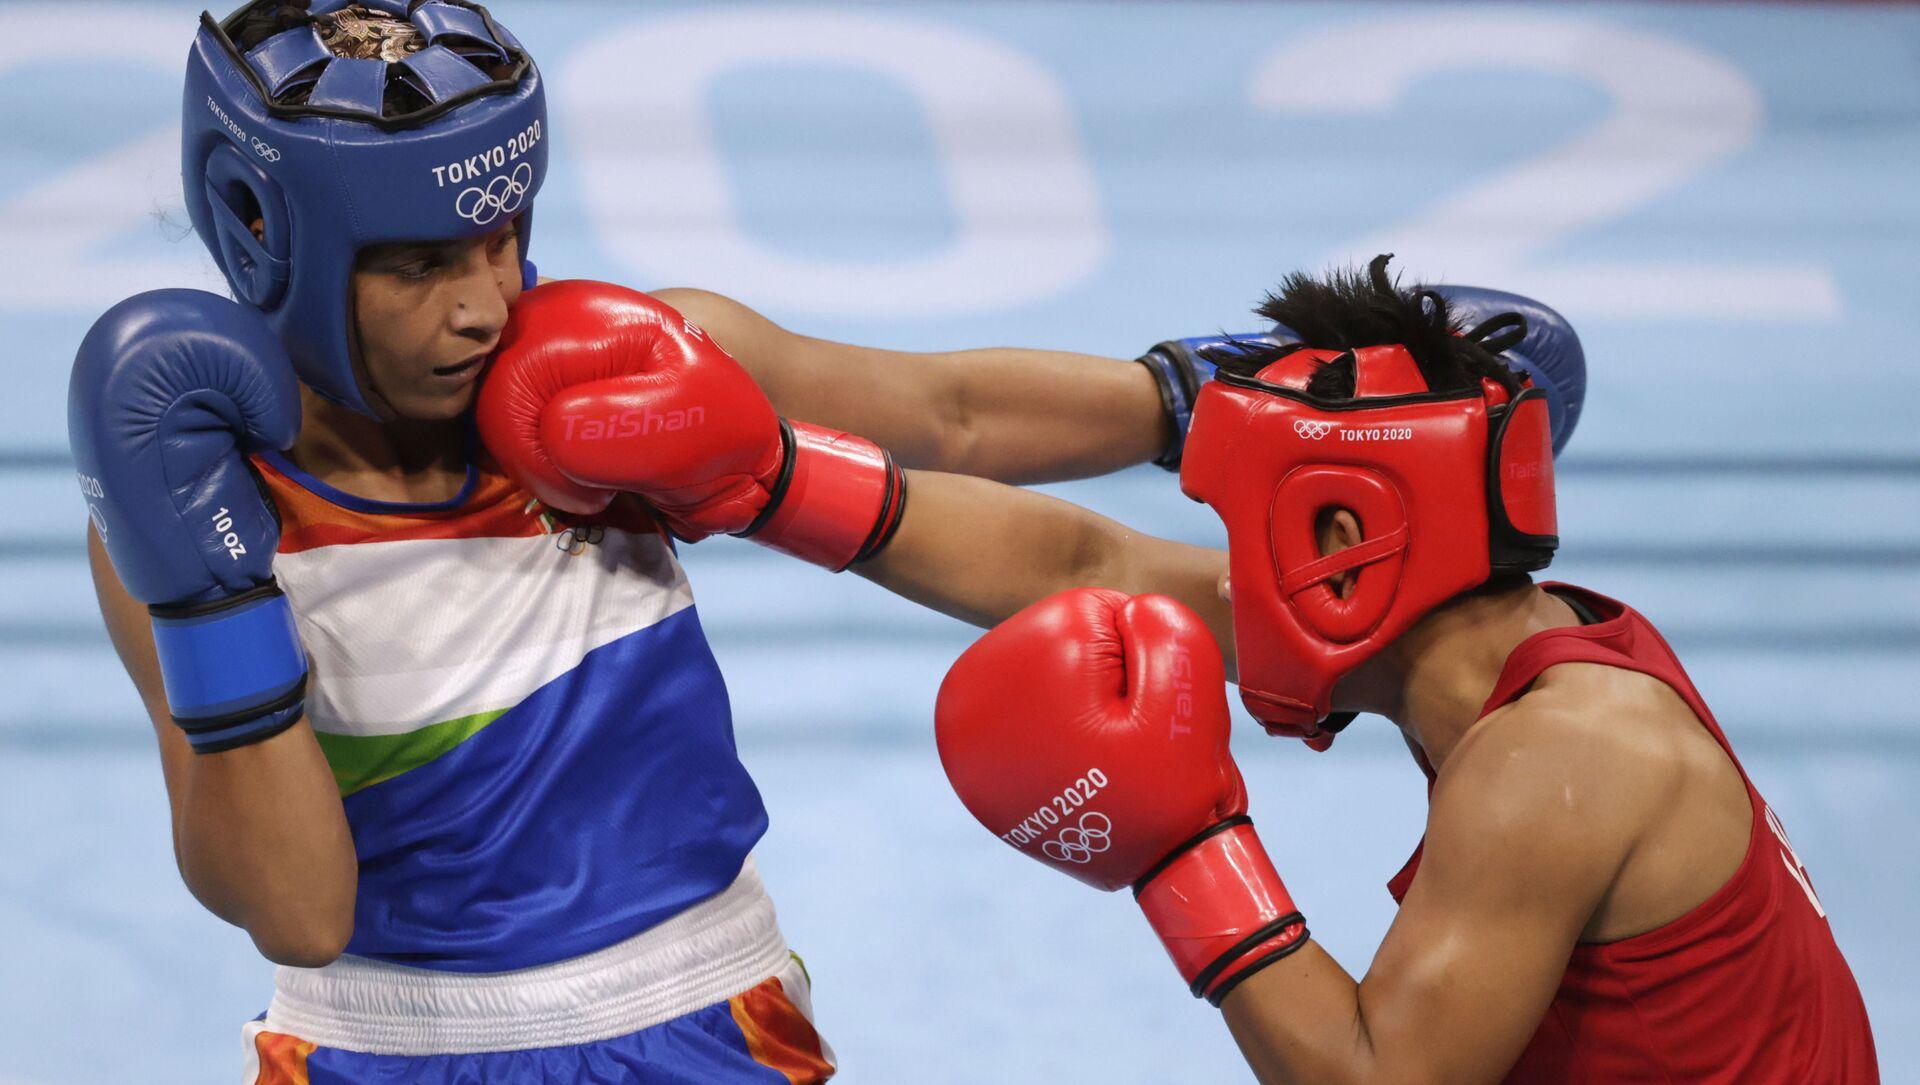 Tokyo 2020 Olympics - Boxing - Women's Lightweight - Last 16 - Kokugikan Arena - Tokyo, Japan - July 30, 2021.   Simranjit Kaur Baatth of India and Sudaporn Seesondee of Thailand in action.  - Sputnik International, 1920, 30.07.2021